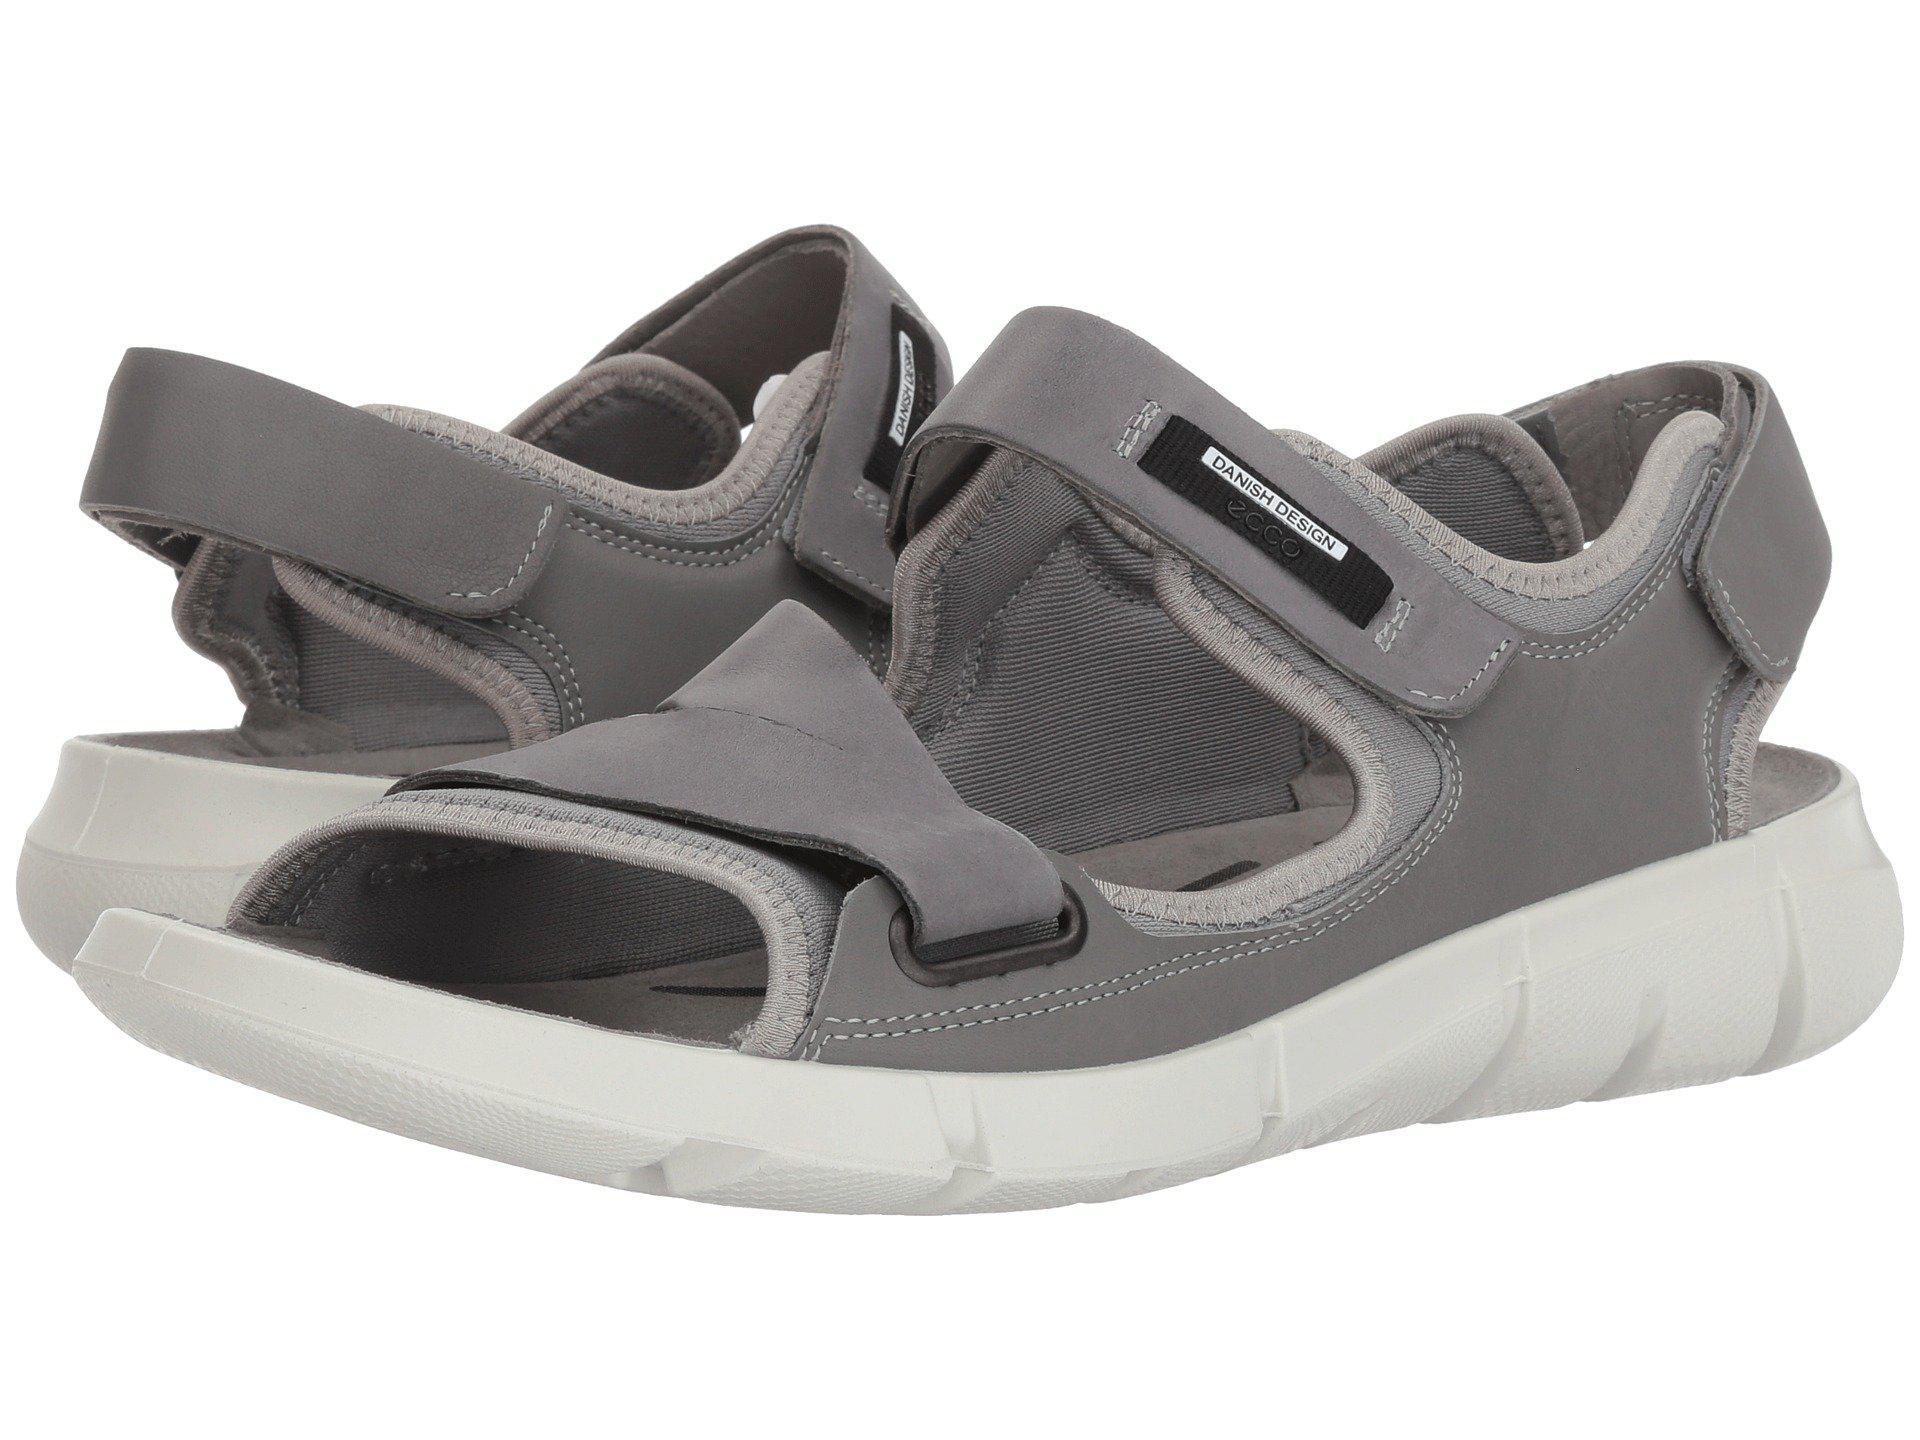 060daa832b72 Lyst - Ecco Intrinsic Sandal 2 in Gray for Men - Save 55%